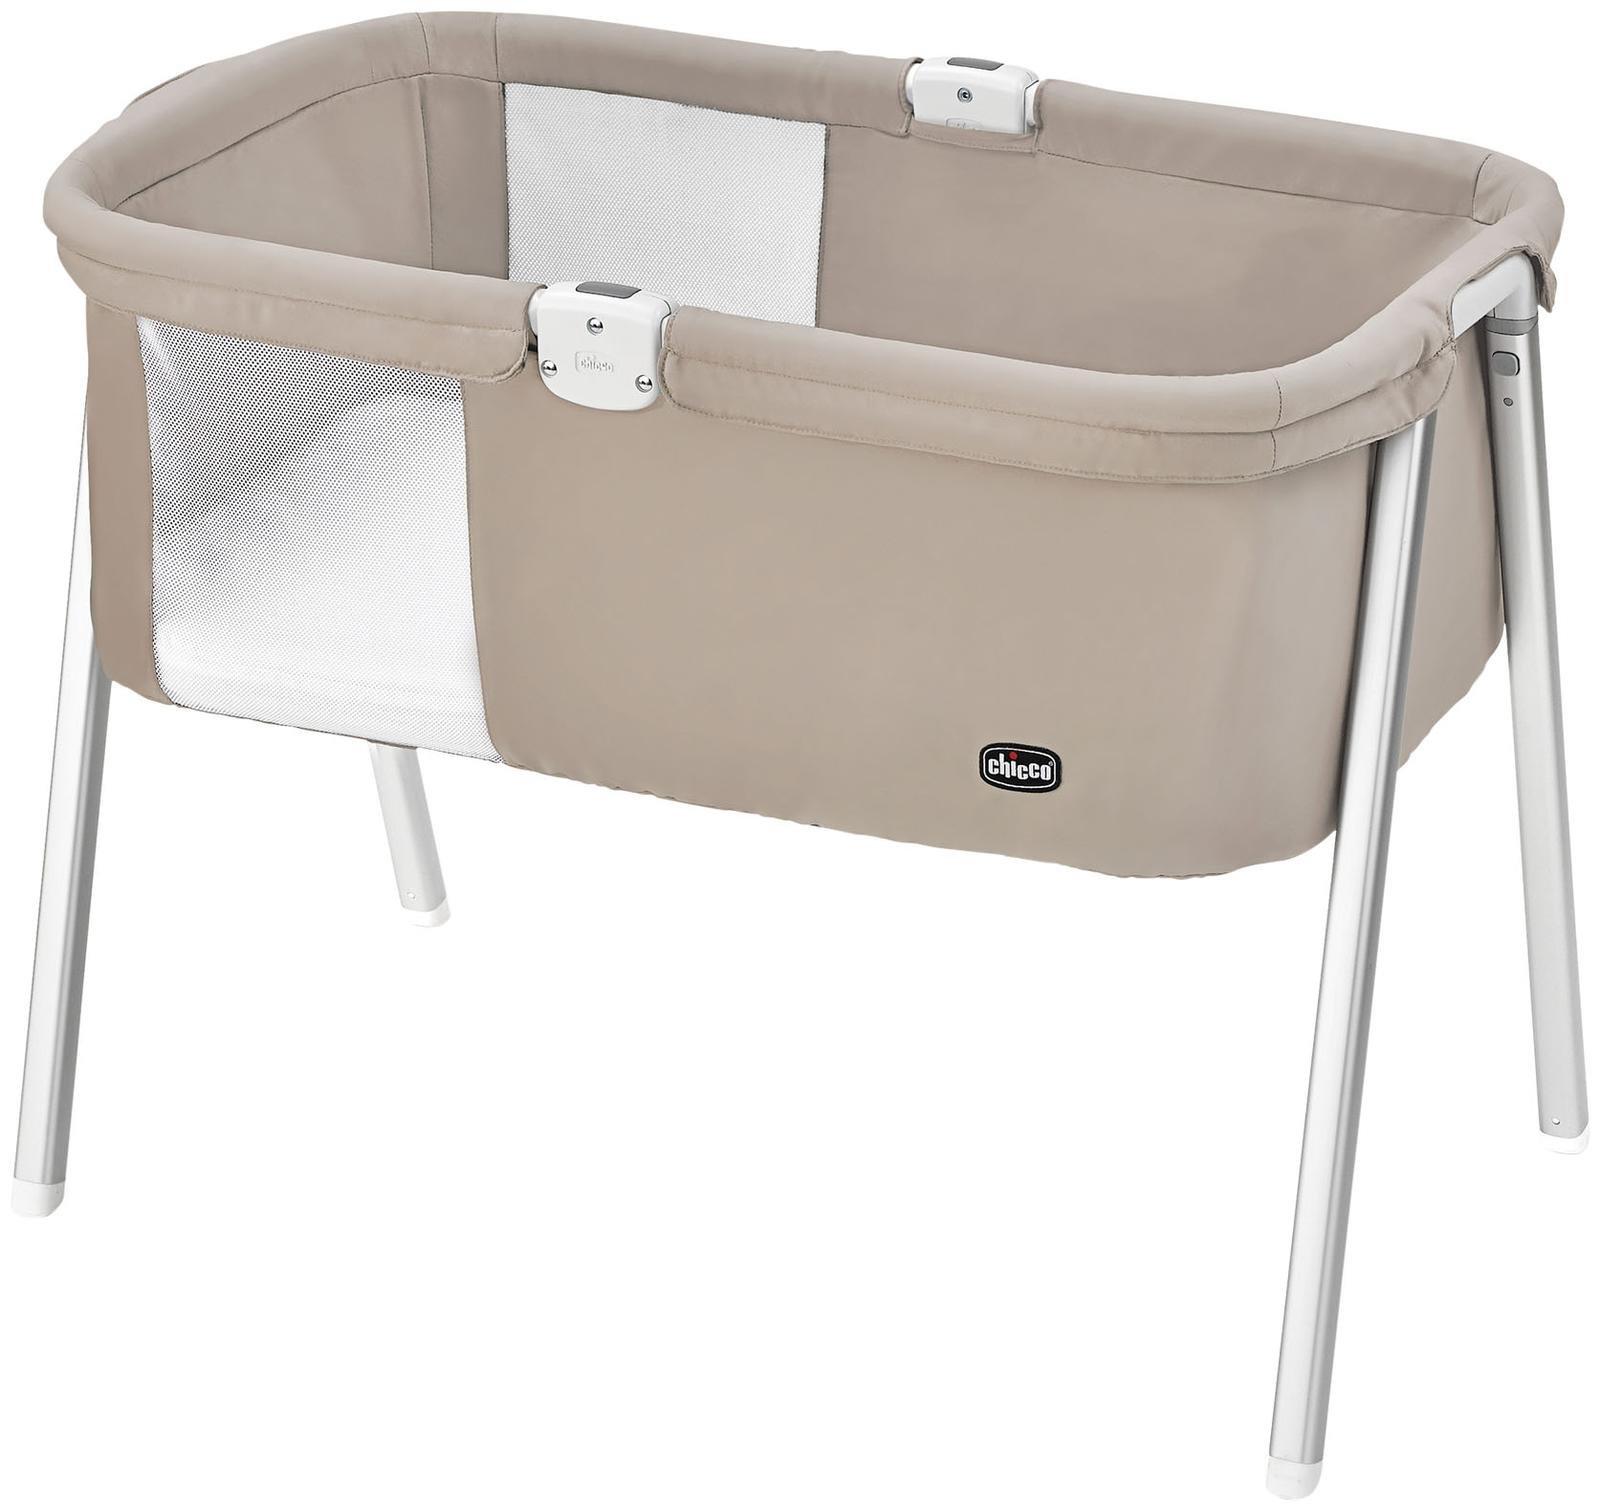 berceau pour bebe chicco lullago avis tests et prix en juill 2018. Black Bedroom Furniture Sets. Home Design Ideas